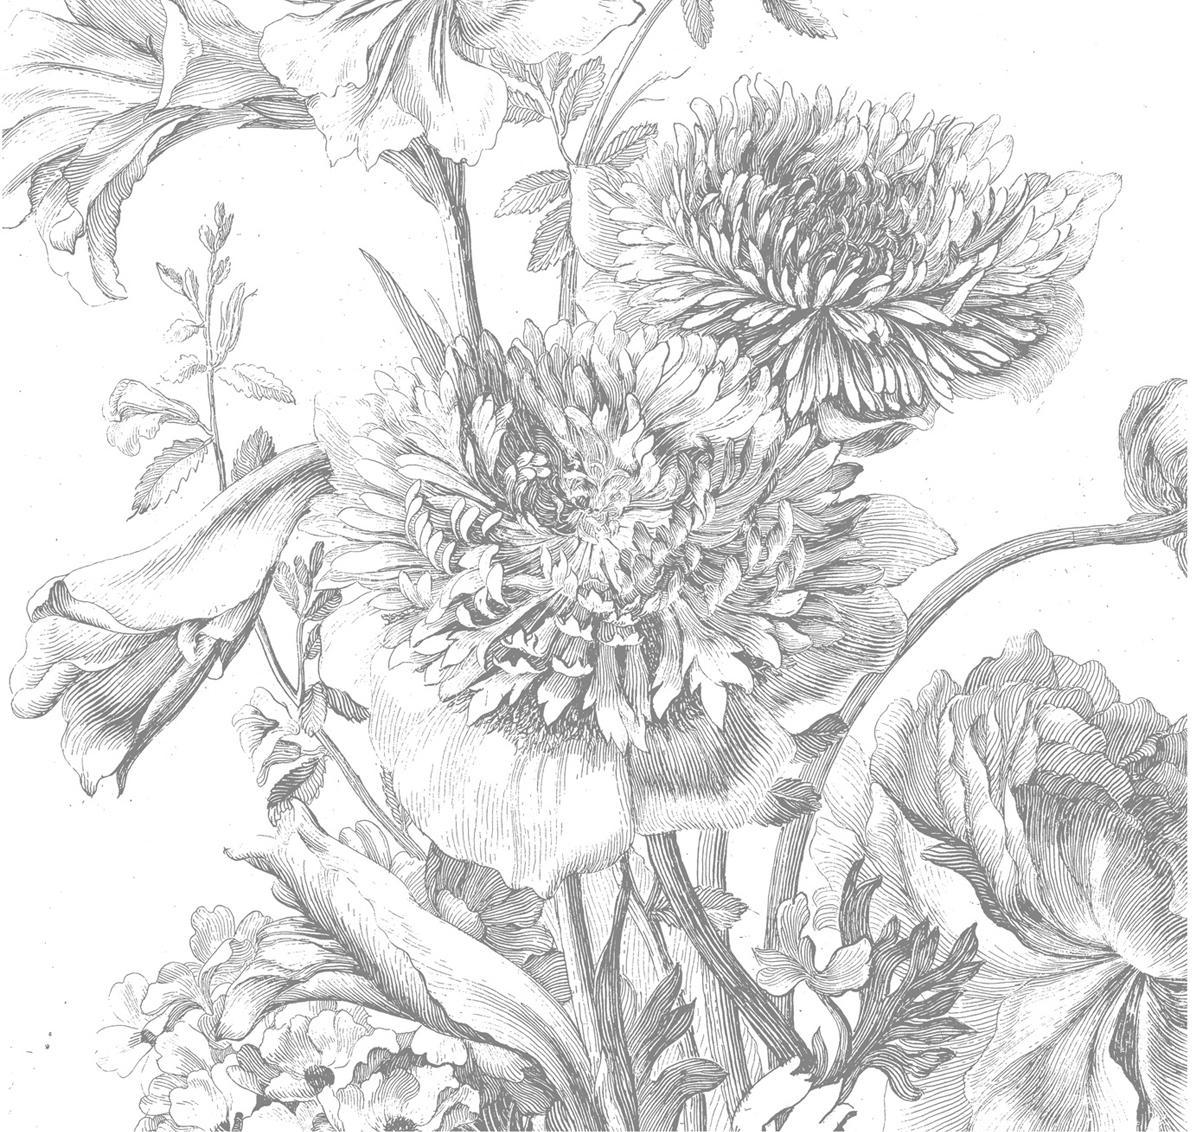 Fotomural Engraved Flowers, Tejido no tejido, ecológica y biodegradable, Gris, blanco, An 292 x Al 280 cm